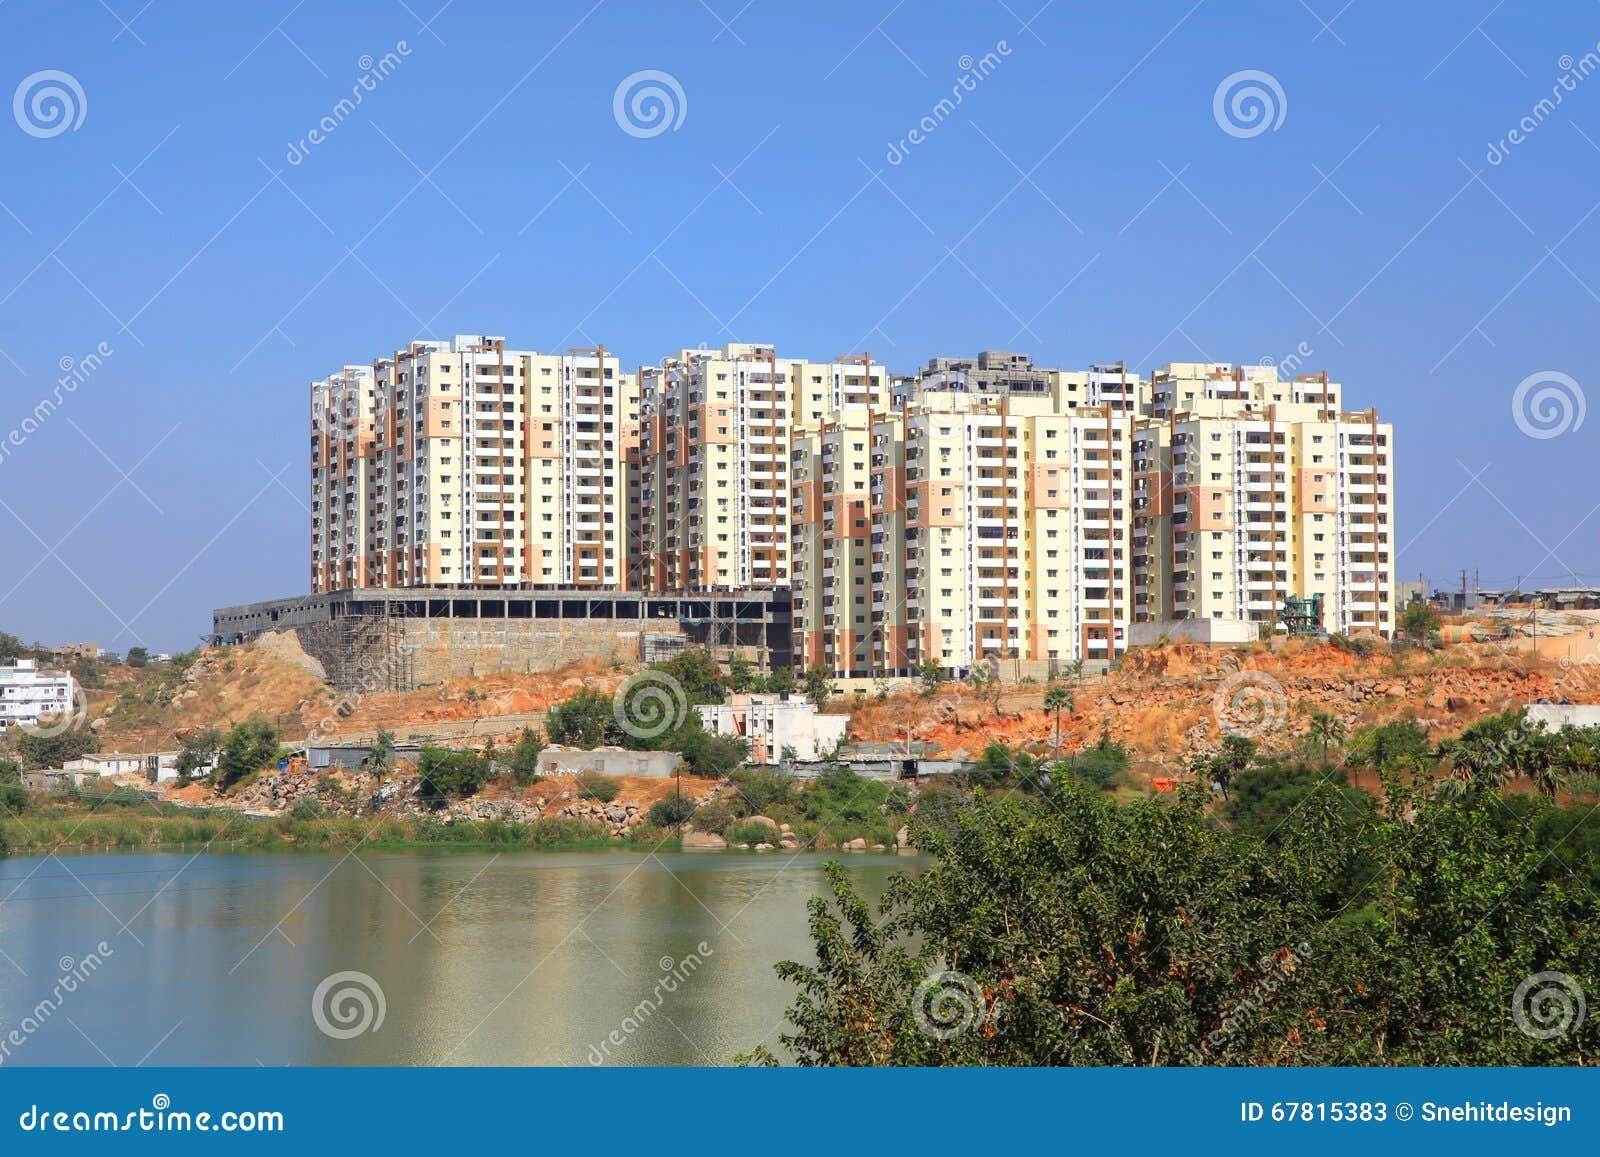 Apartment Building Construction new apartment building construction stock photo - image: 67815383